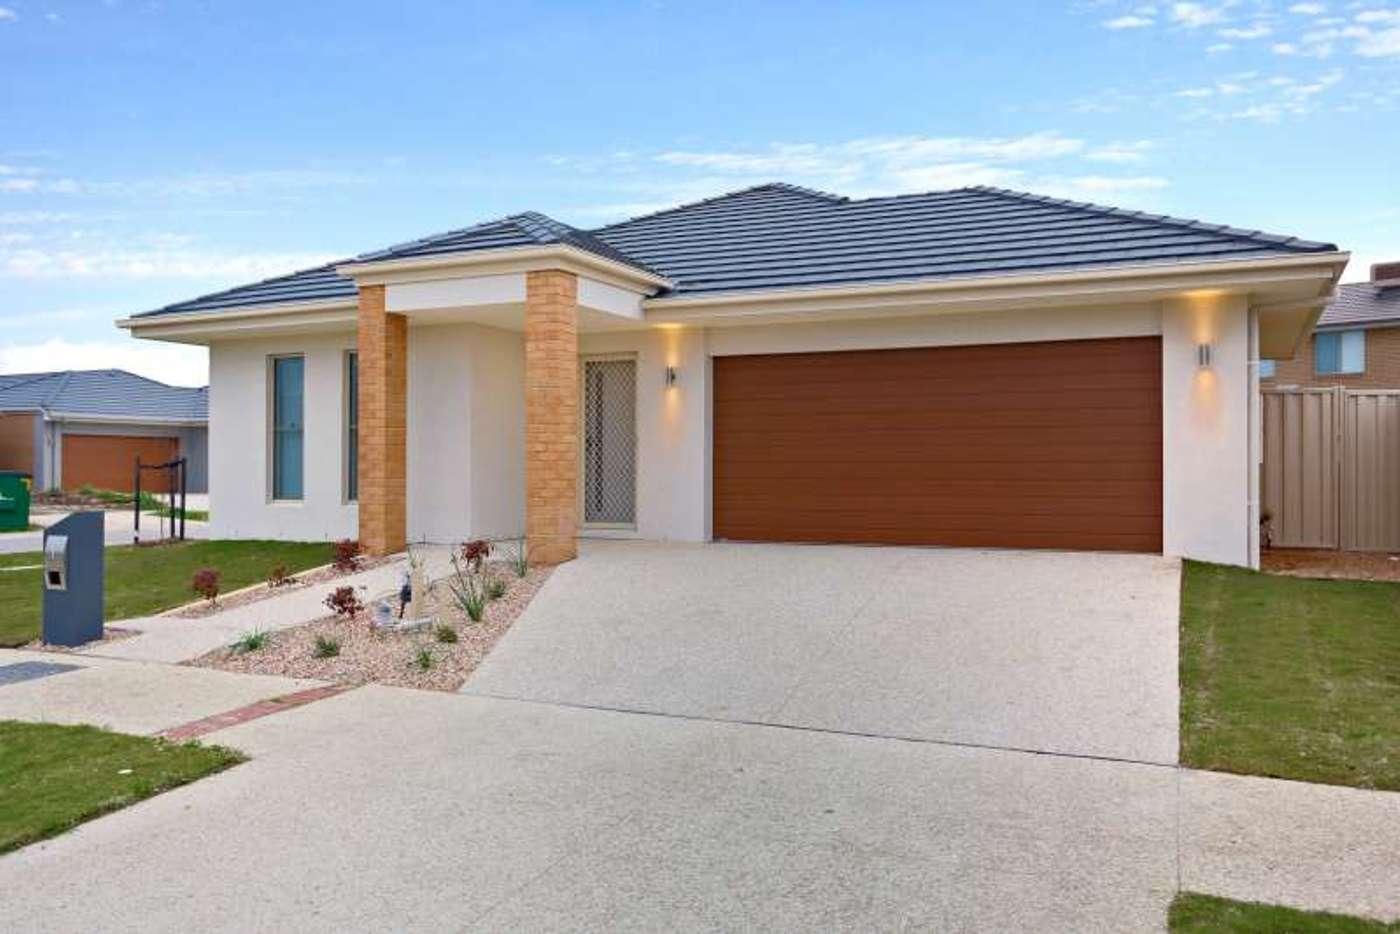 Main view of Homely house listing, 25 Ashford Drive, Pakenham VIC 3810